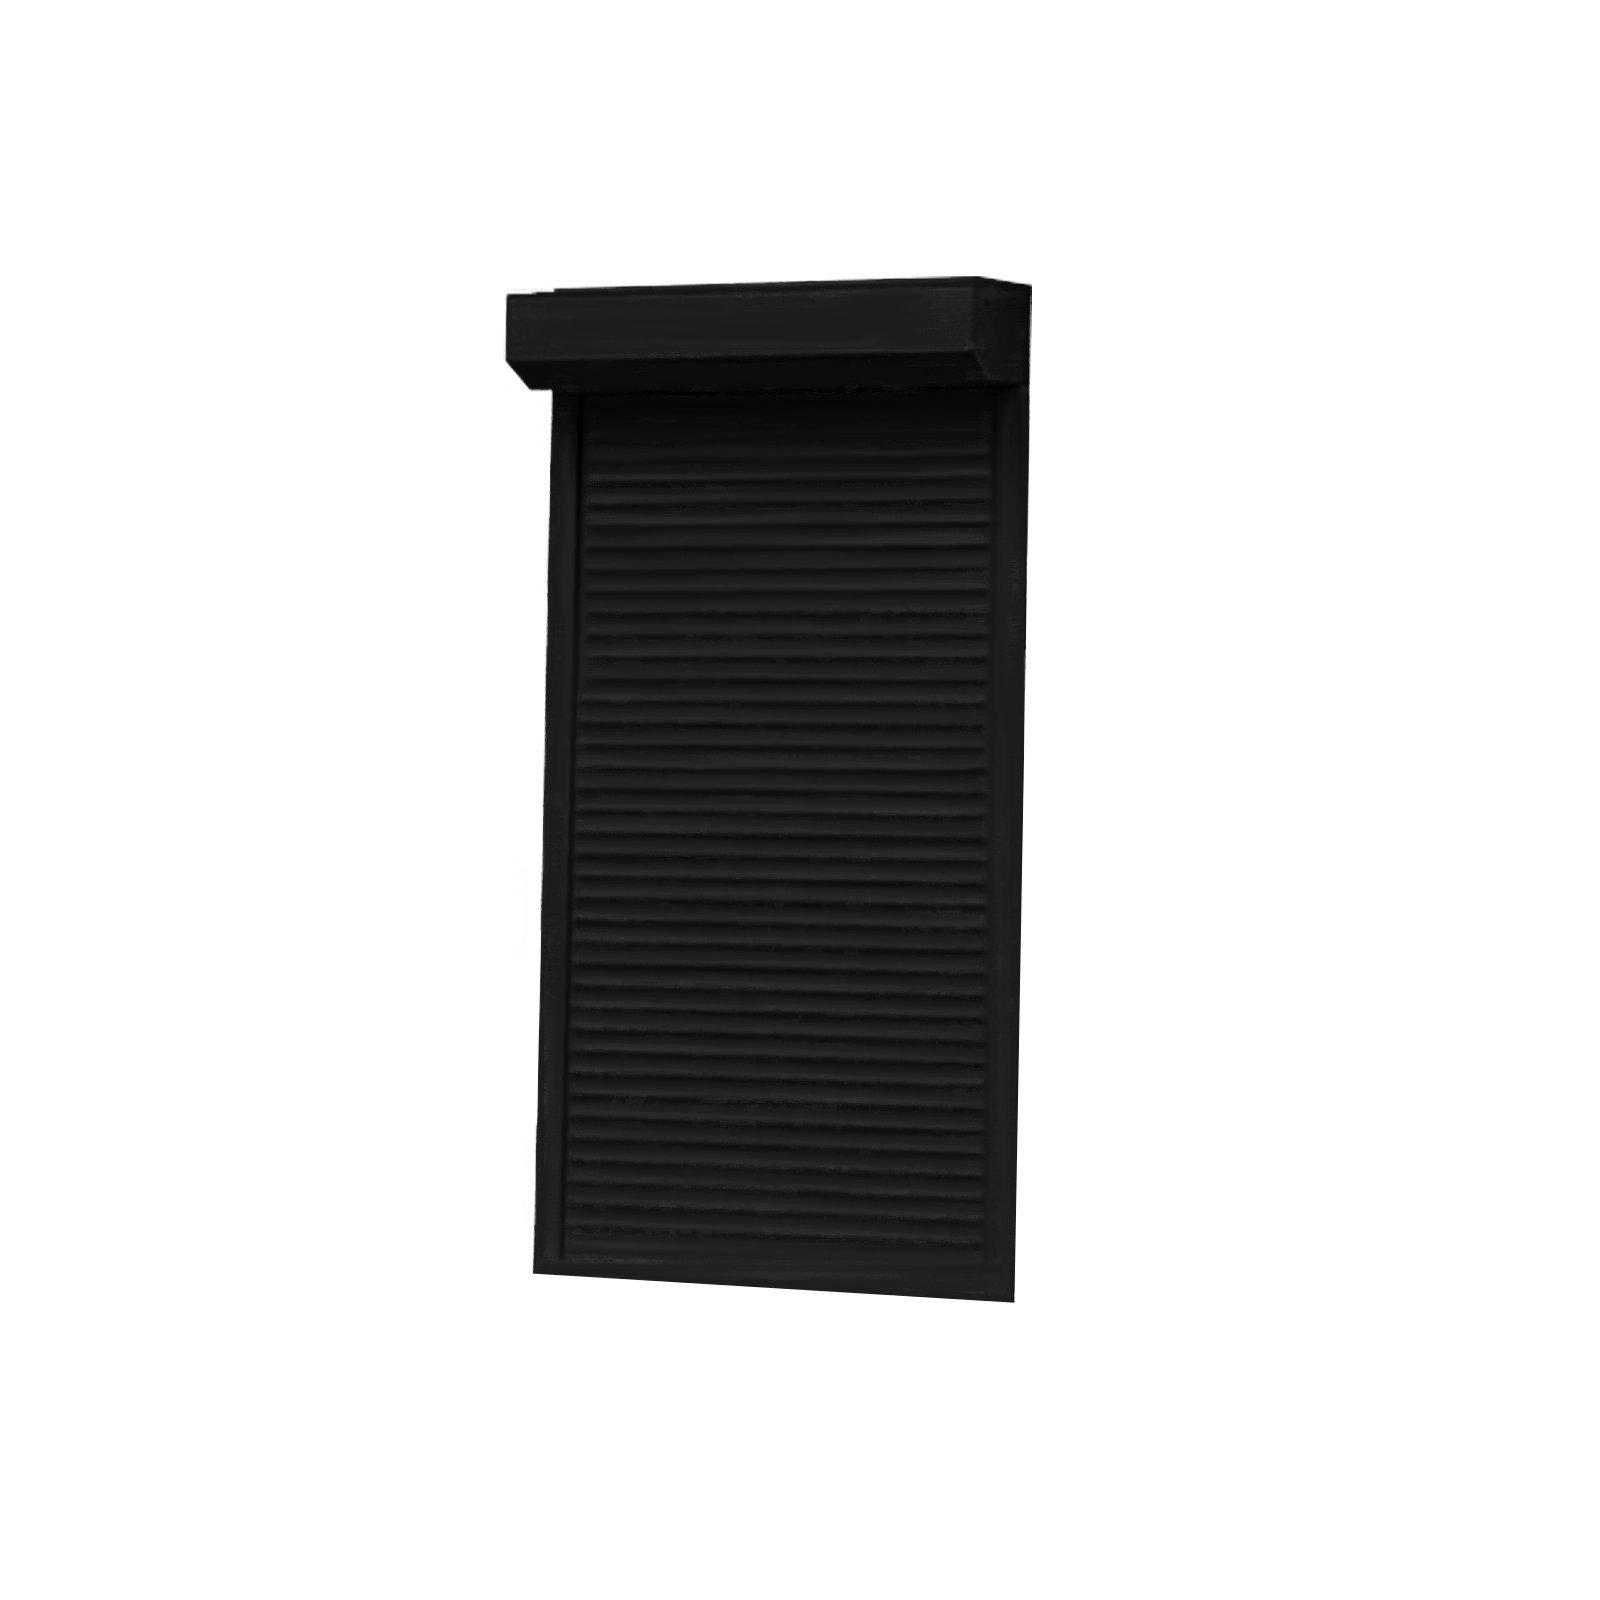 Everton 2001-2200mm H x 2201-2400mm W On-Wall Battery Roller Shutter